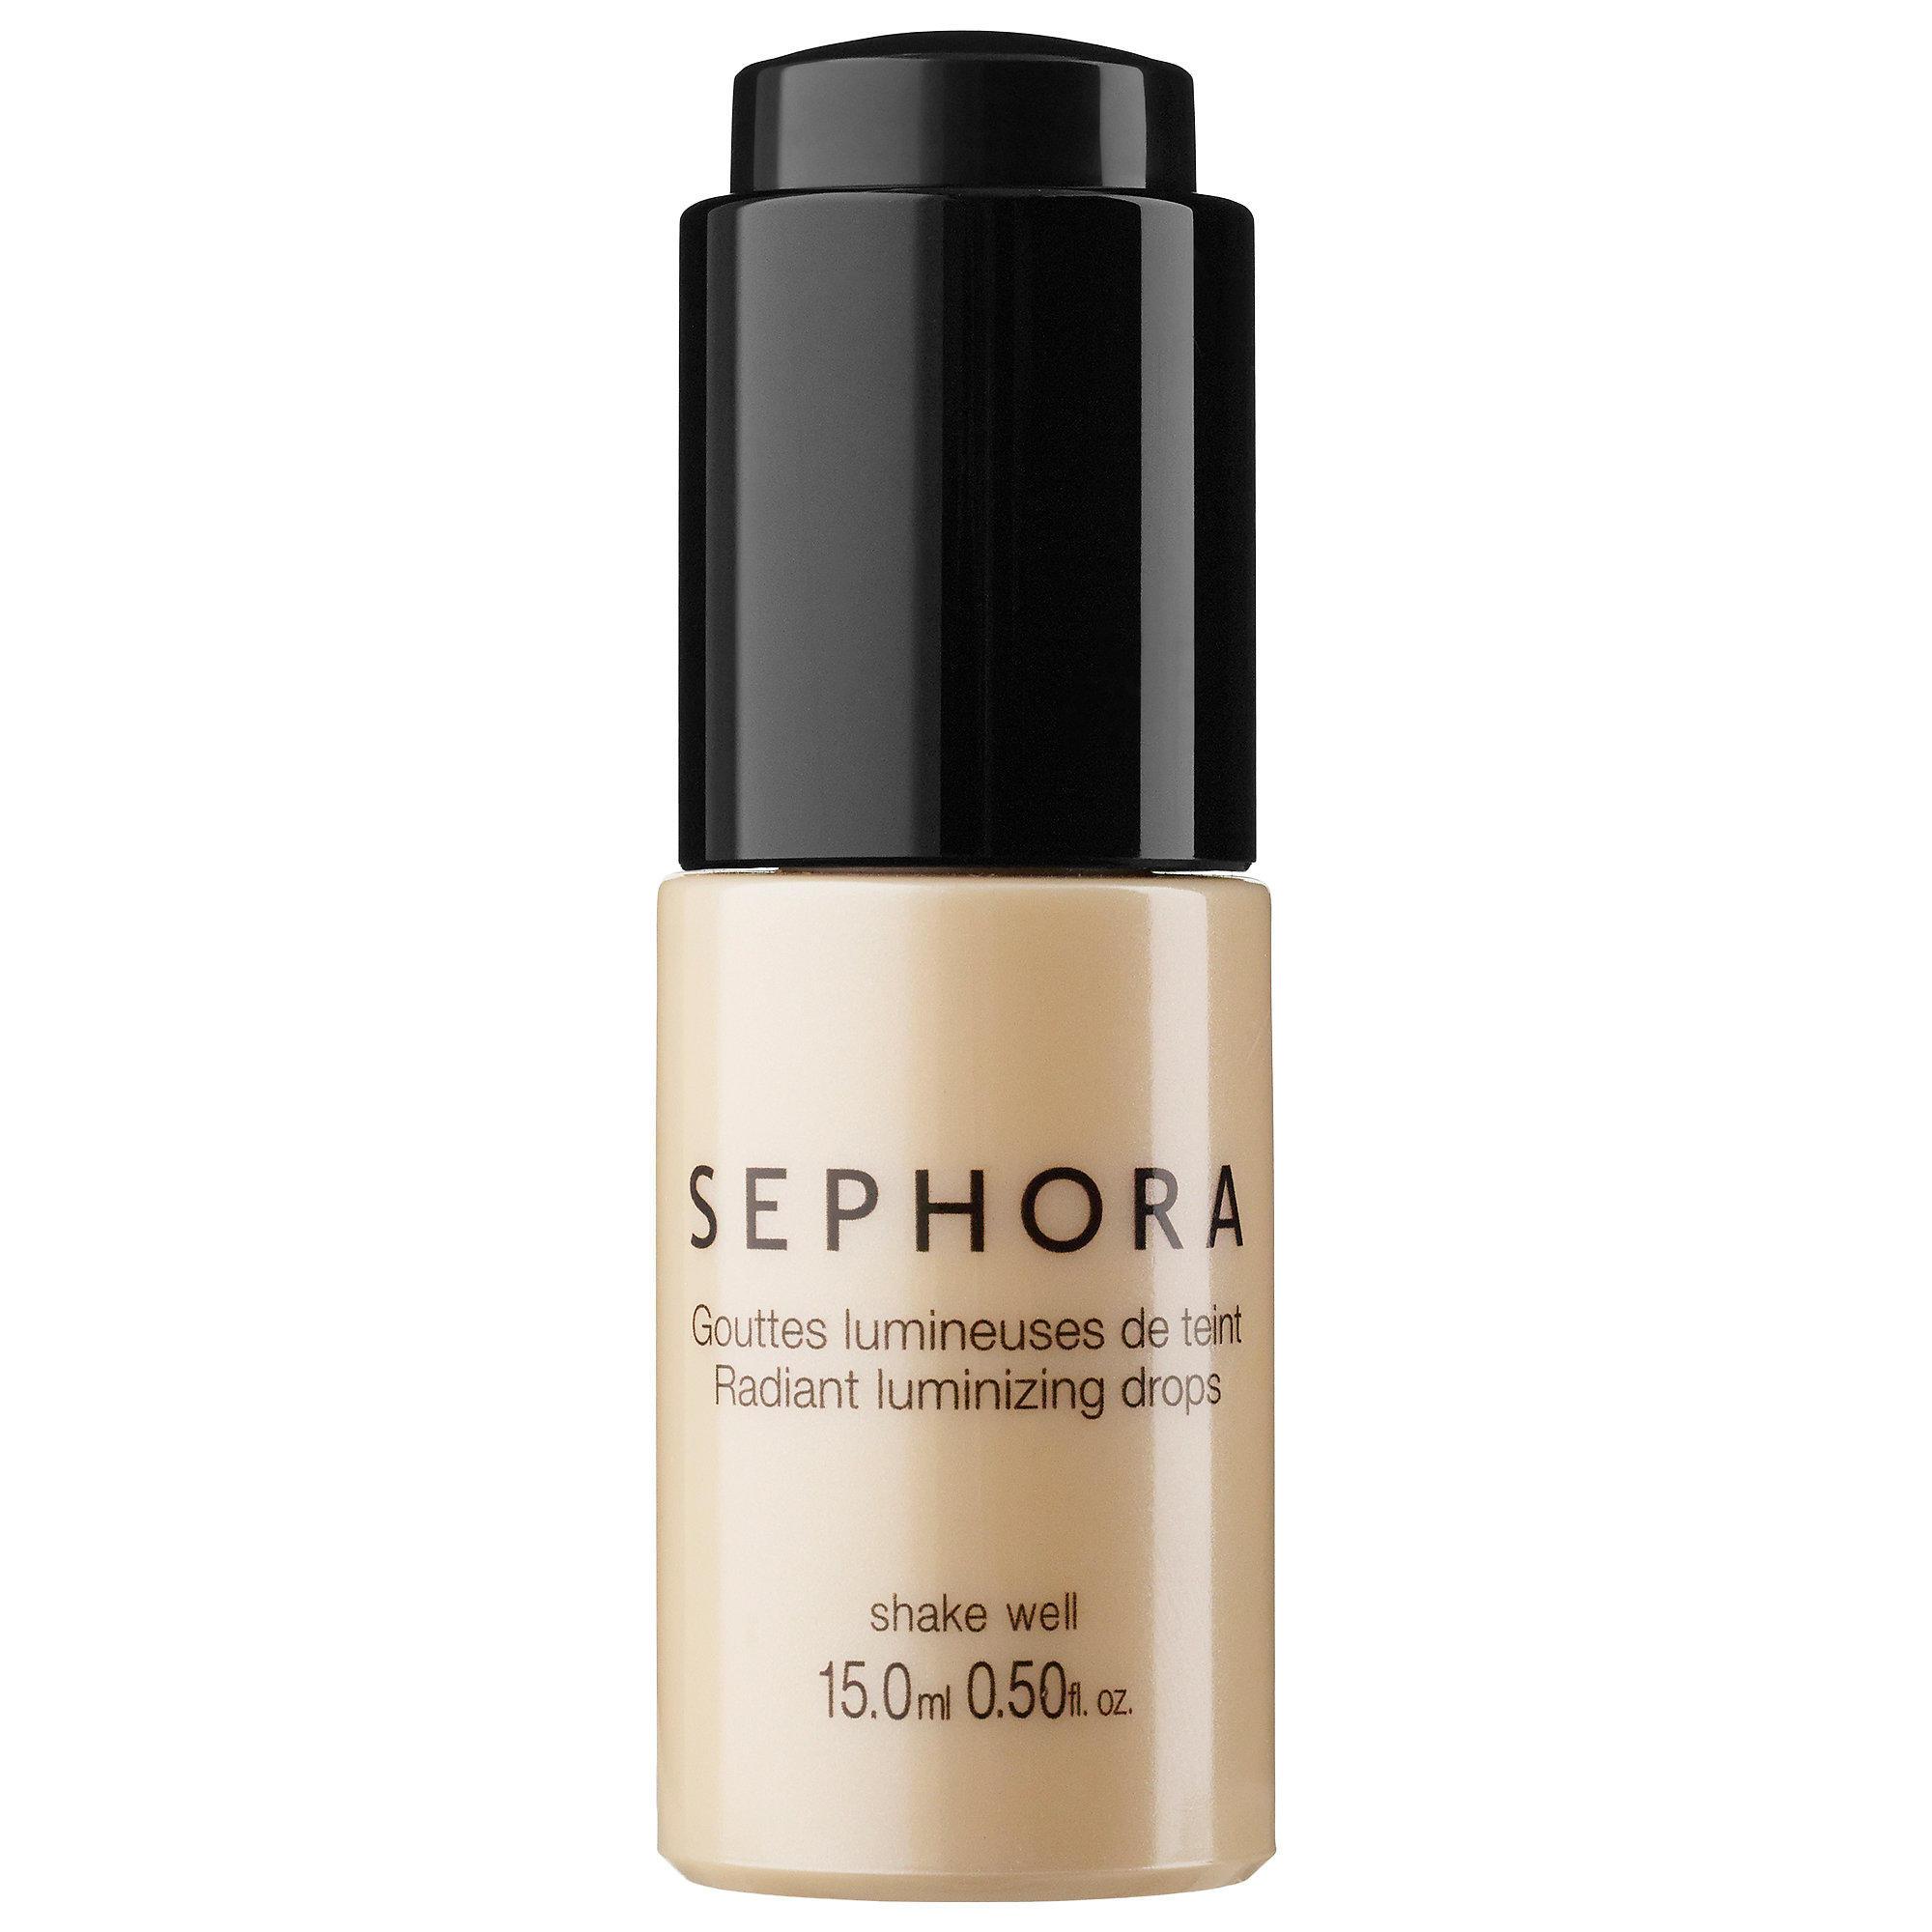 Sephora Radiant Luminizing Drops Morning Light 03